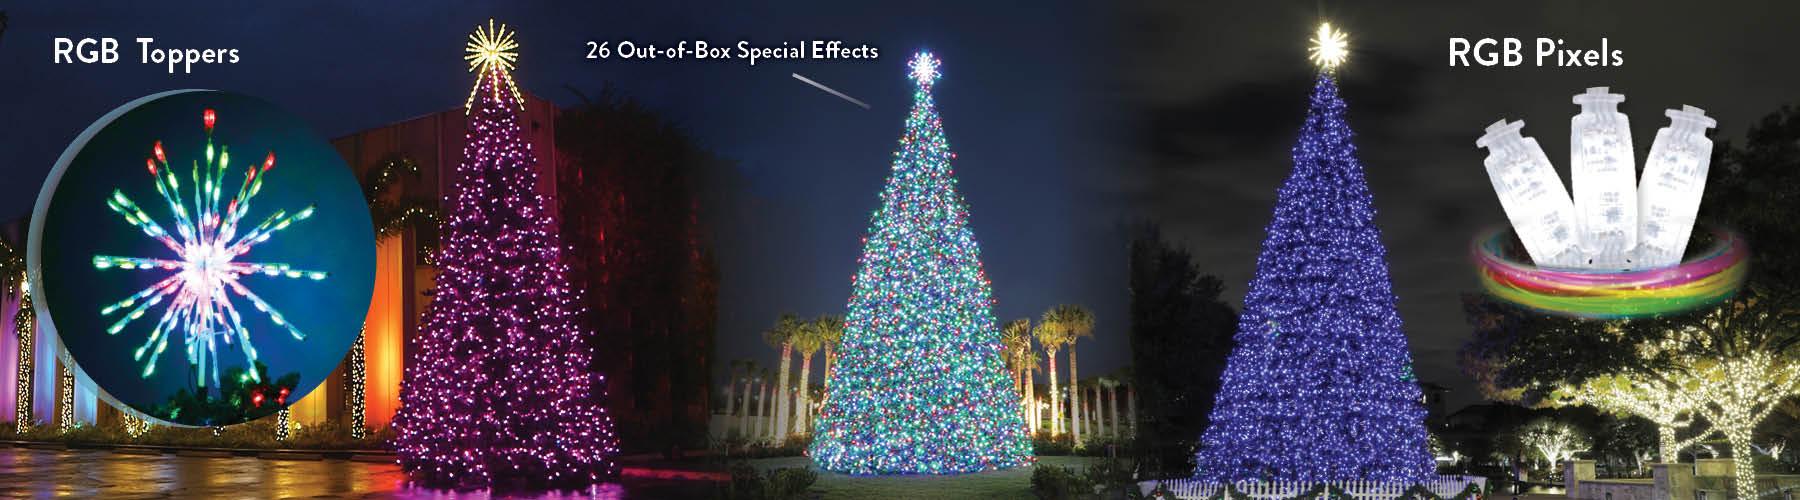 Commercial RGB Christmas Trees